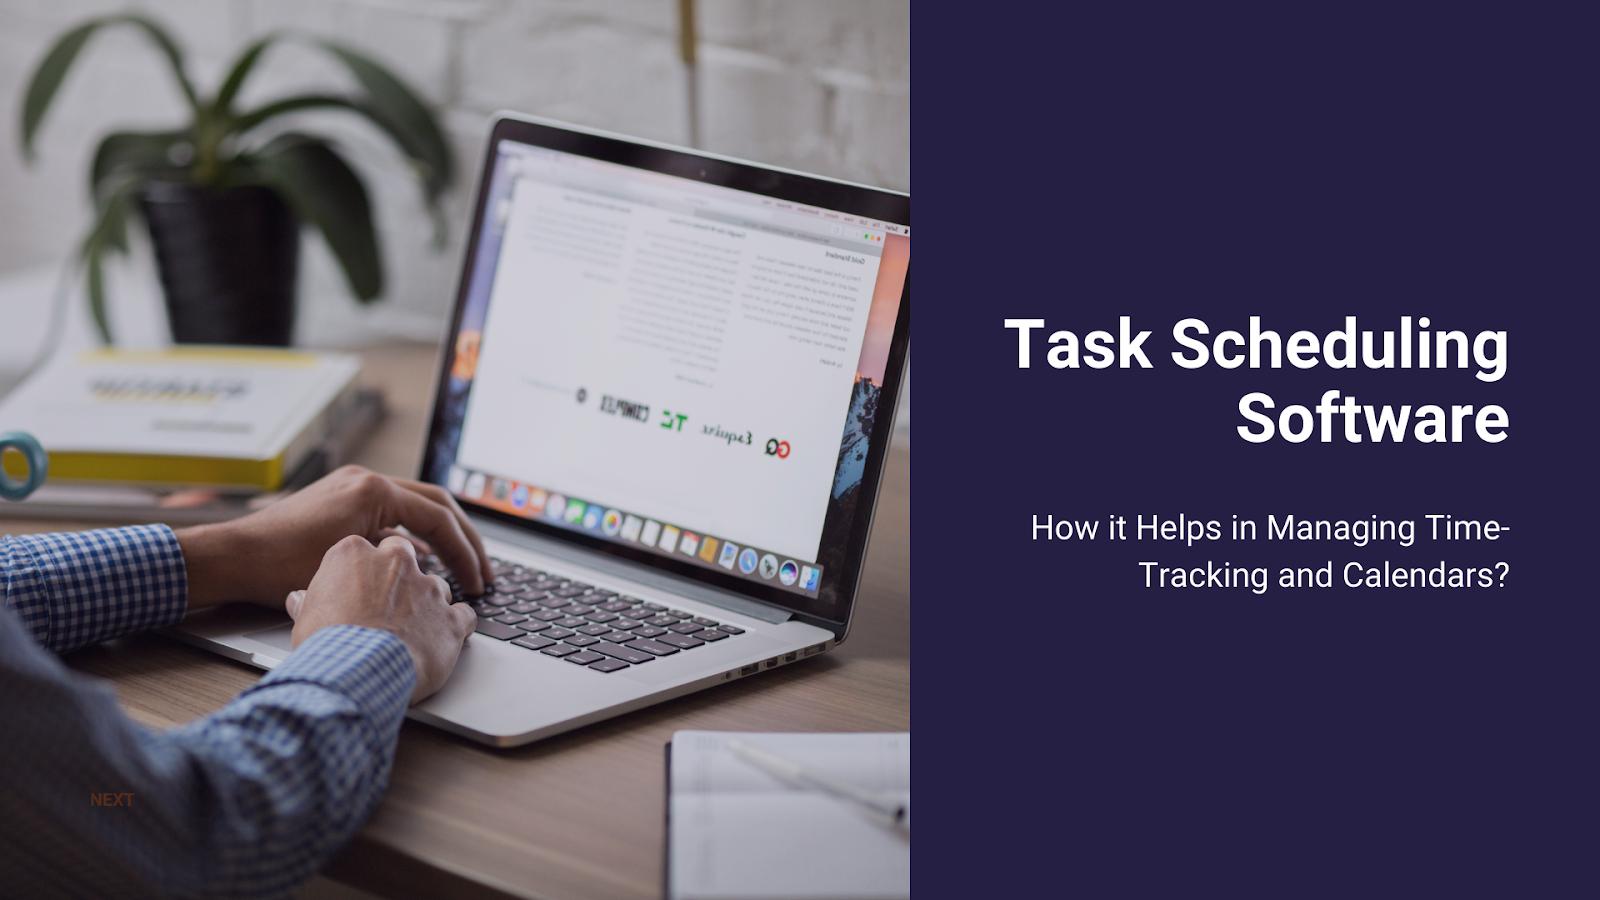 Task Scheduling Software